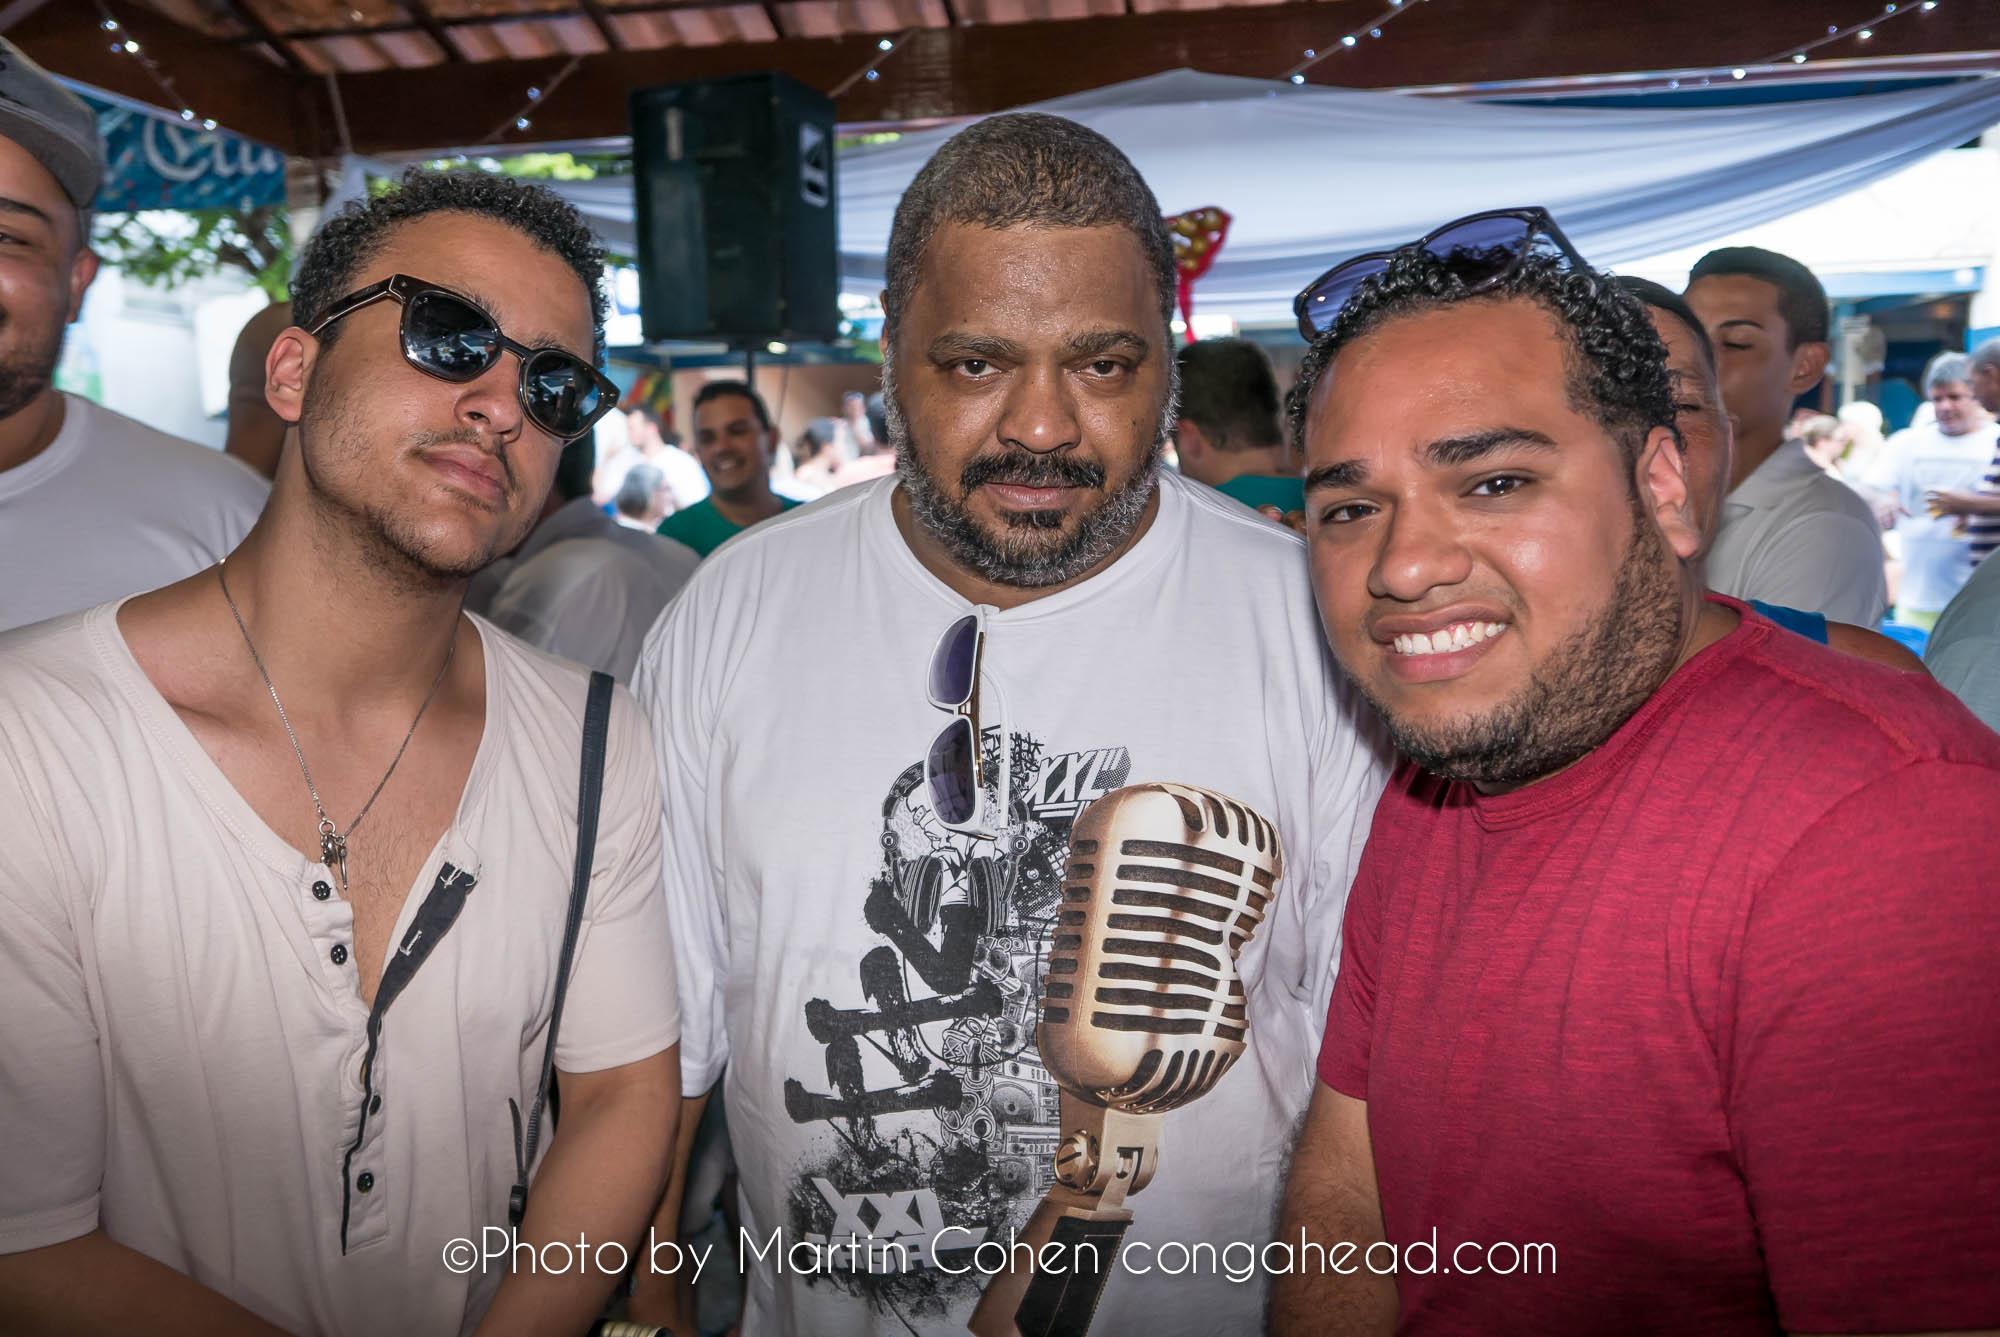 Matthew Cohen, Arlindo Cruz and Javier Raez